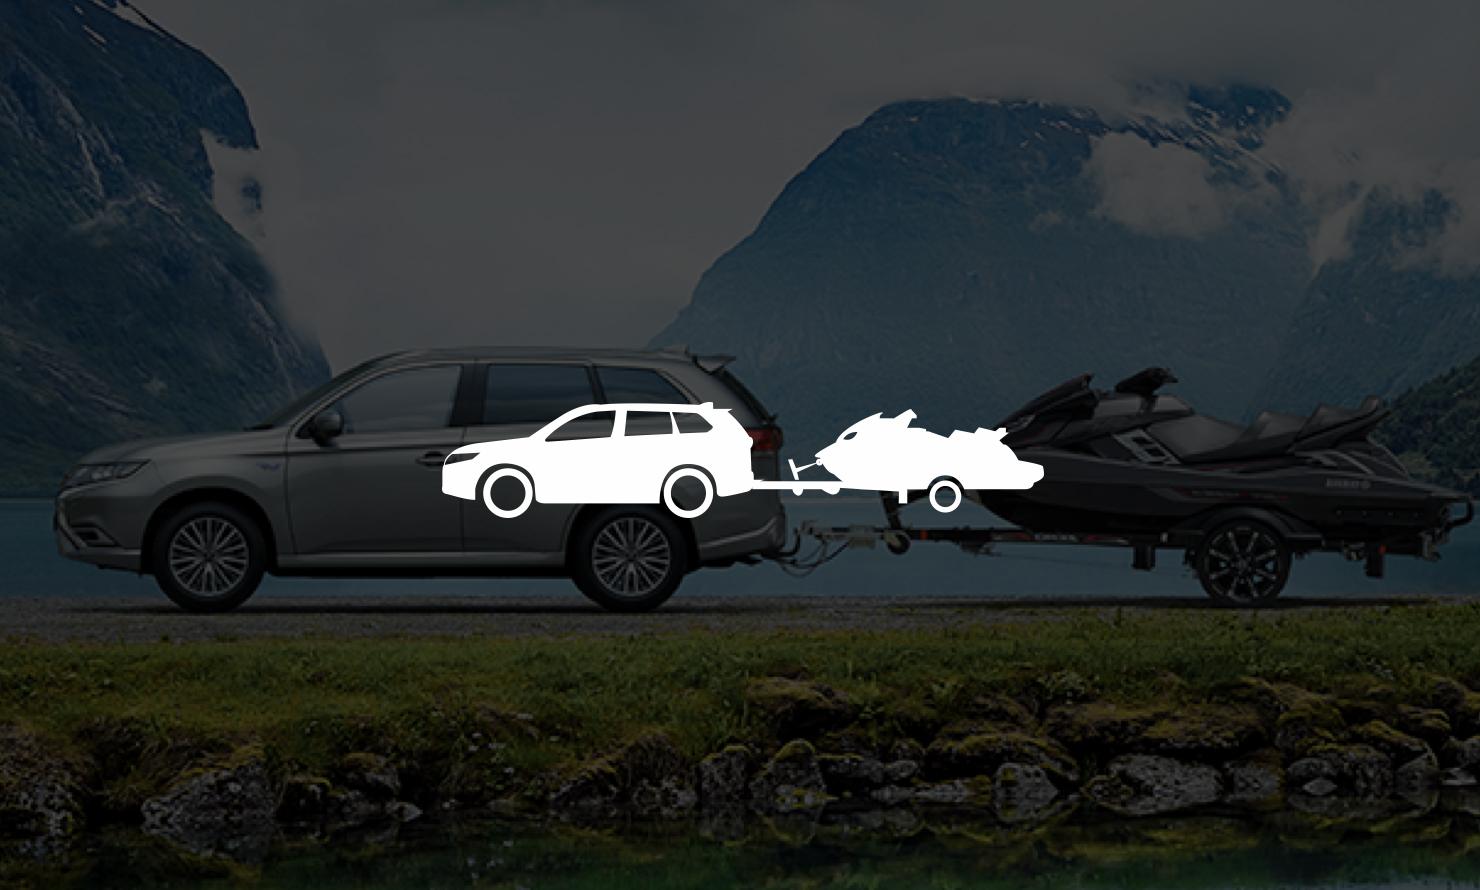 https://www.kubelibre.com/uploads/Slider-work-tutti-clienti/mitsubishi-outlander-phev-be-part-of-the-energy-nazaré-alessandro-marcianò-logo-outlander-phev.jpg